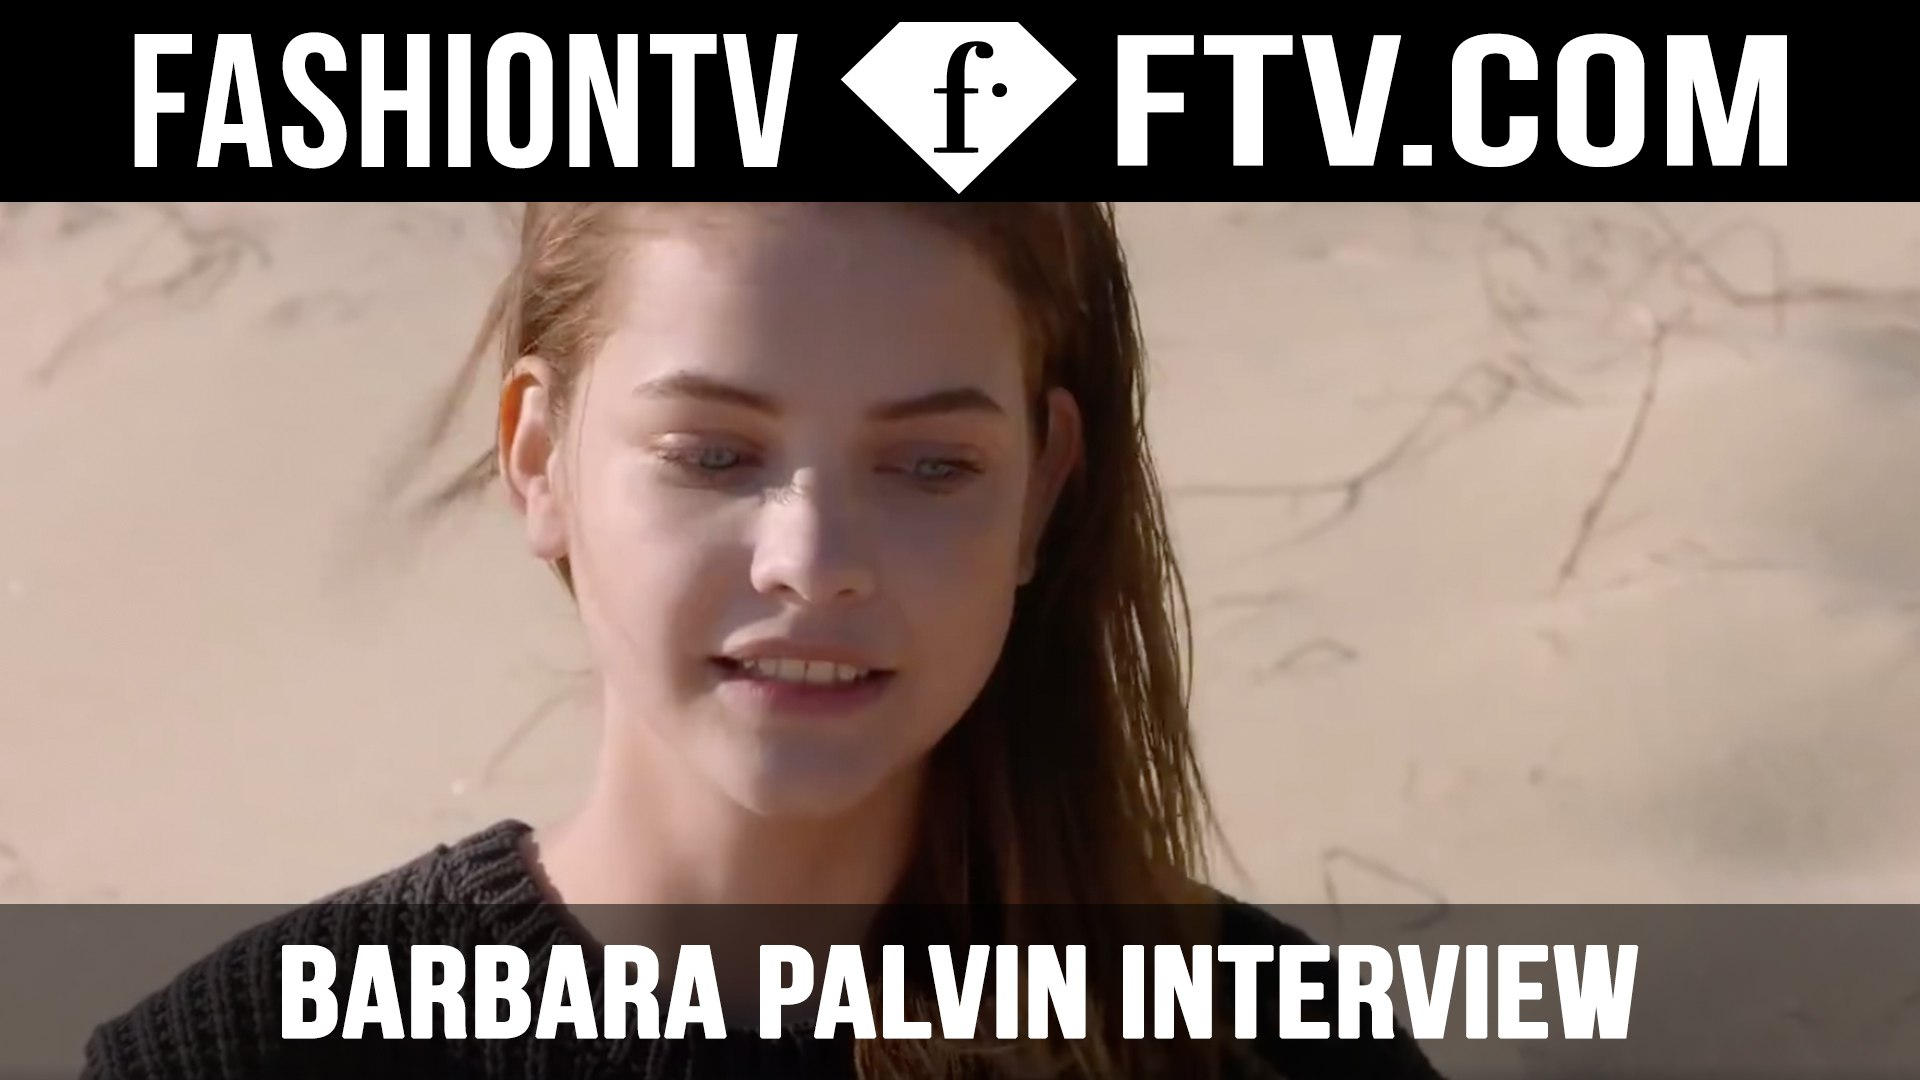 Barbara Palvin Interview